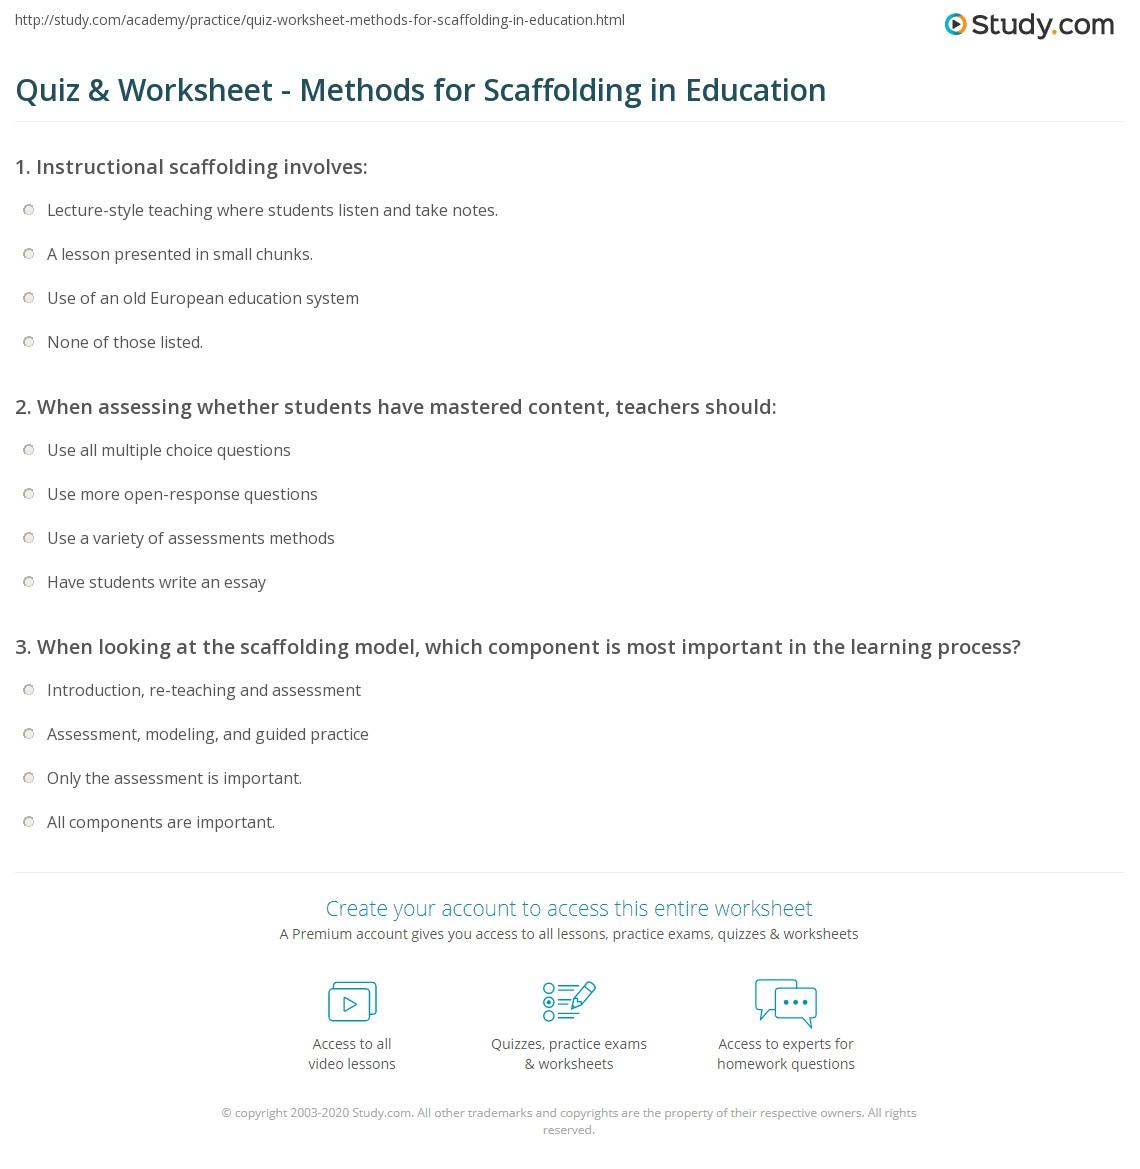 Quiz Worksheet Methods For Scaffolding In Education Study